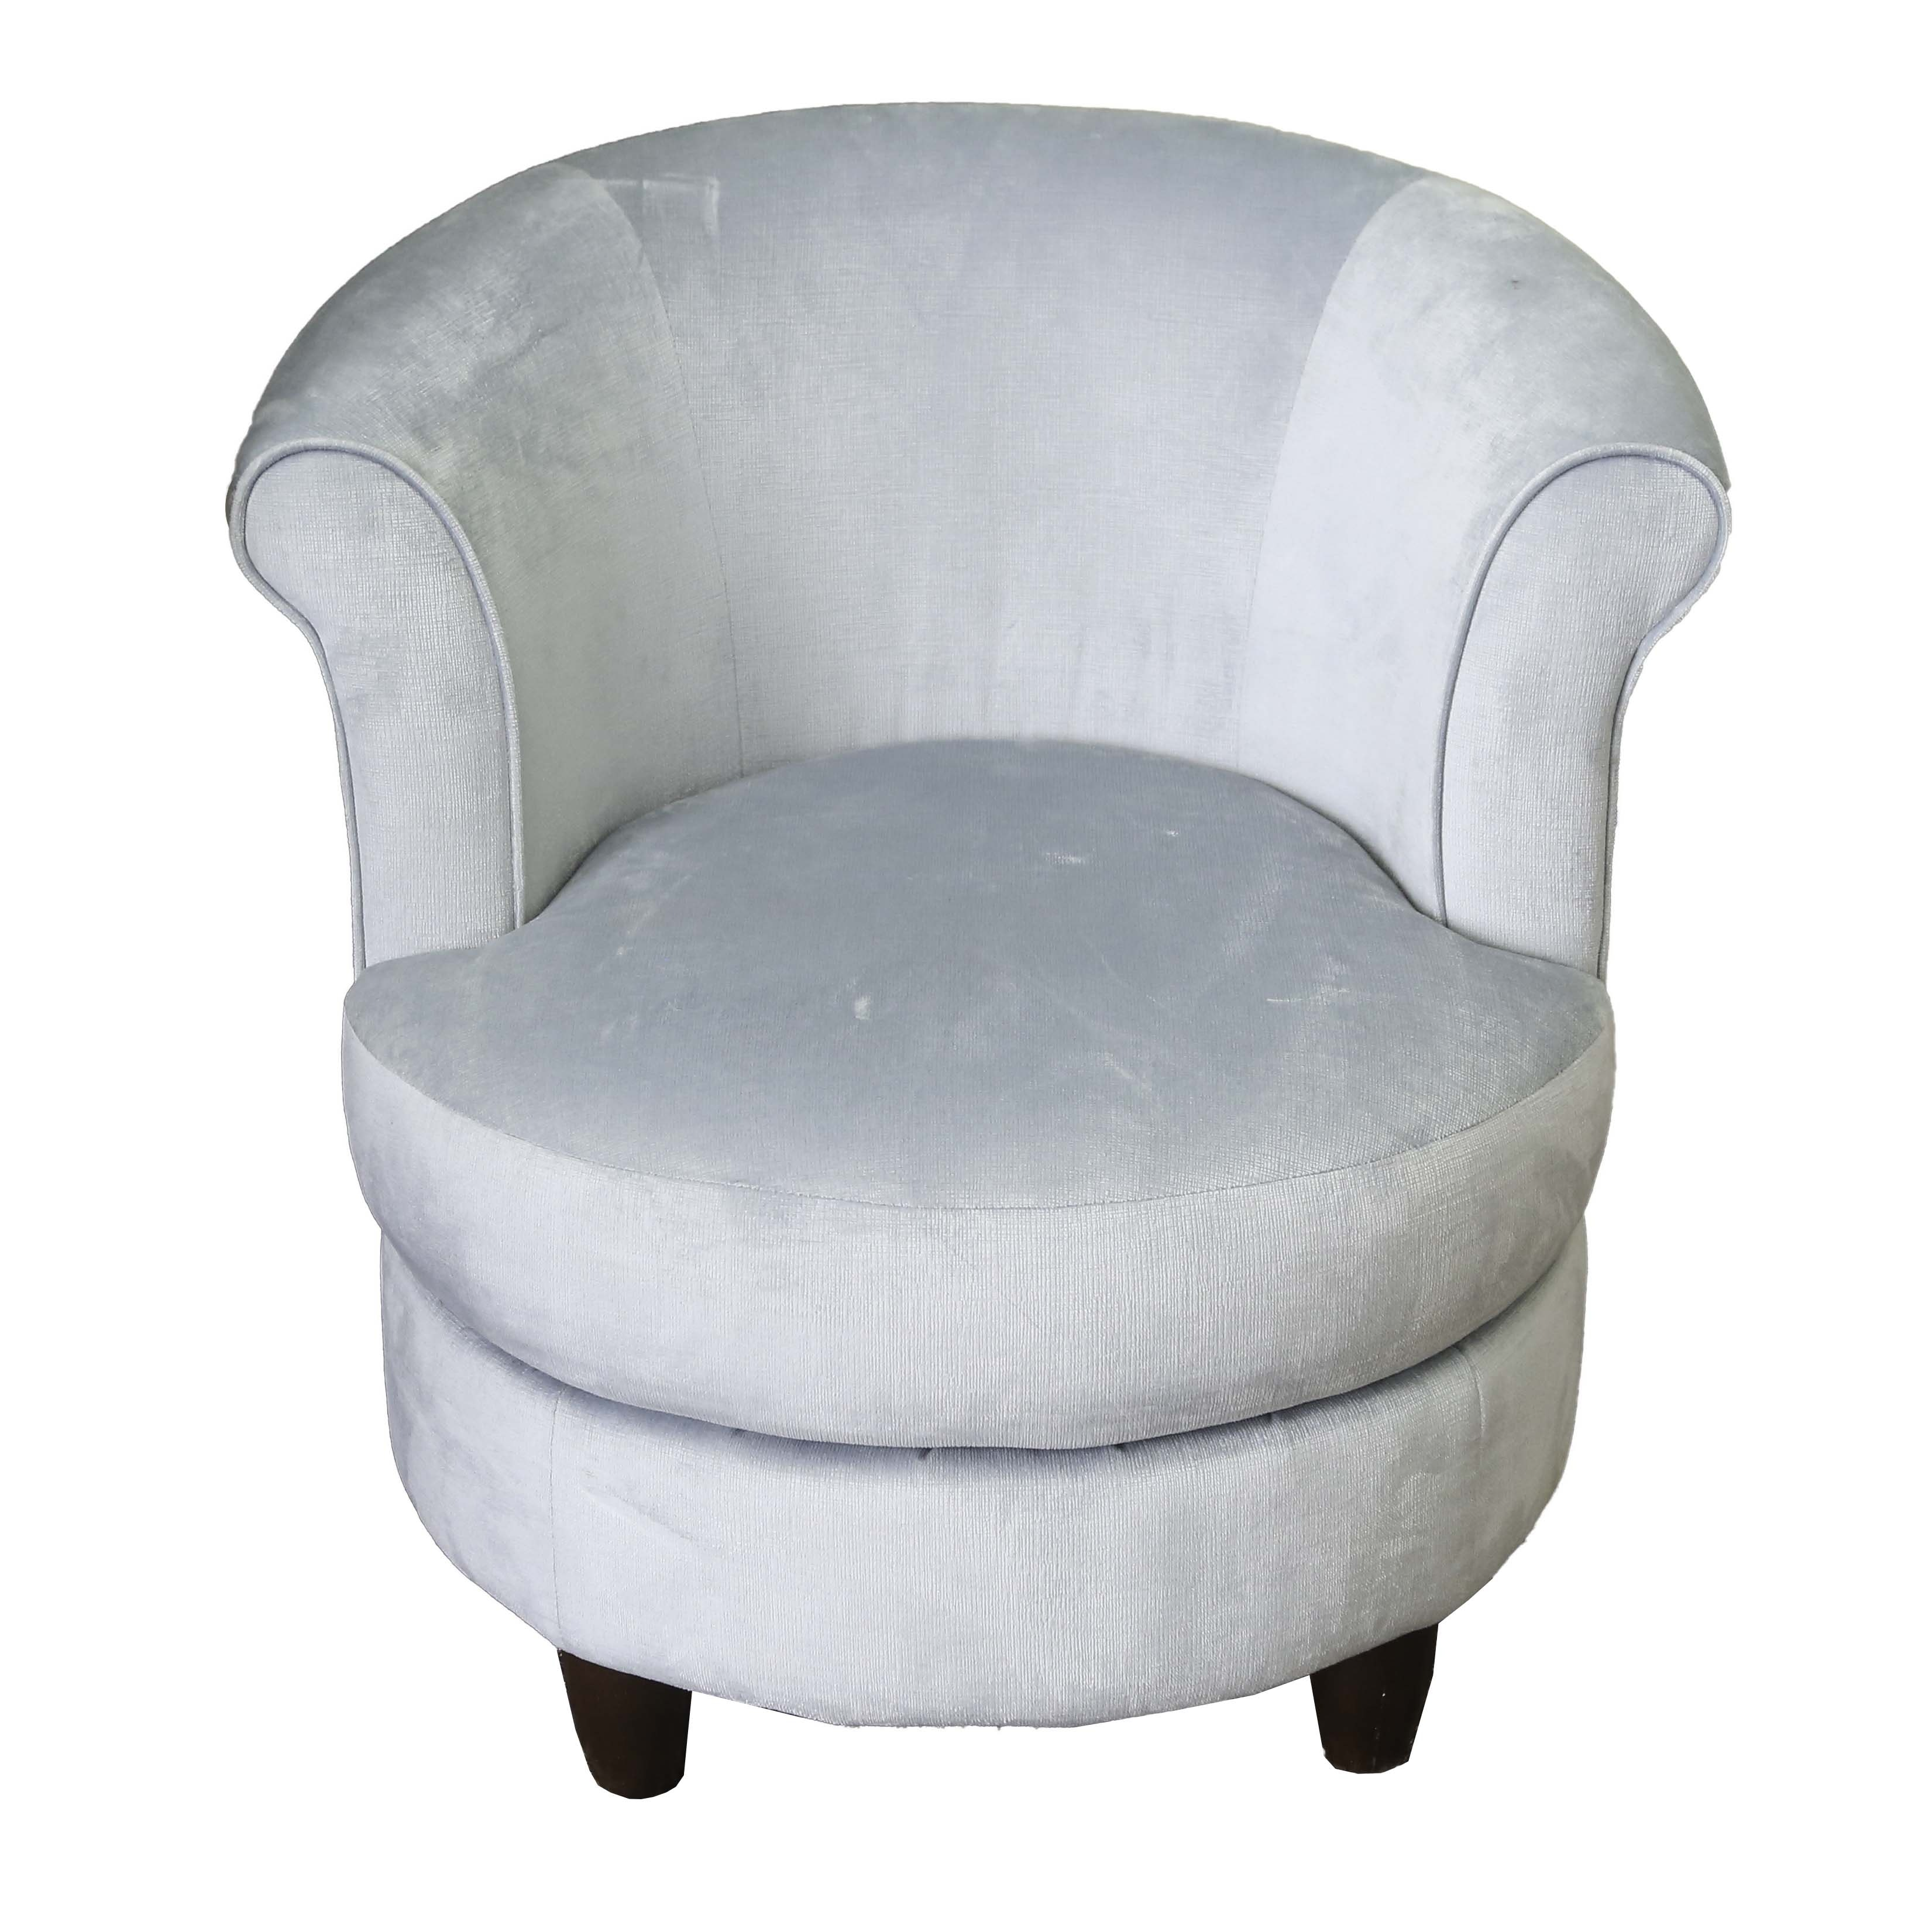 Havertys Phoebe Swivel Accent Chair